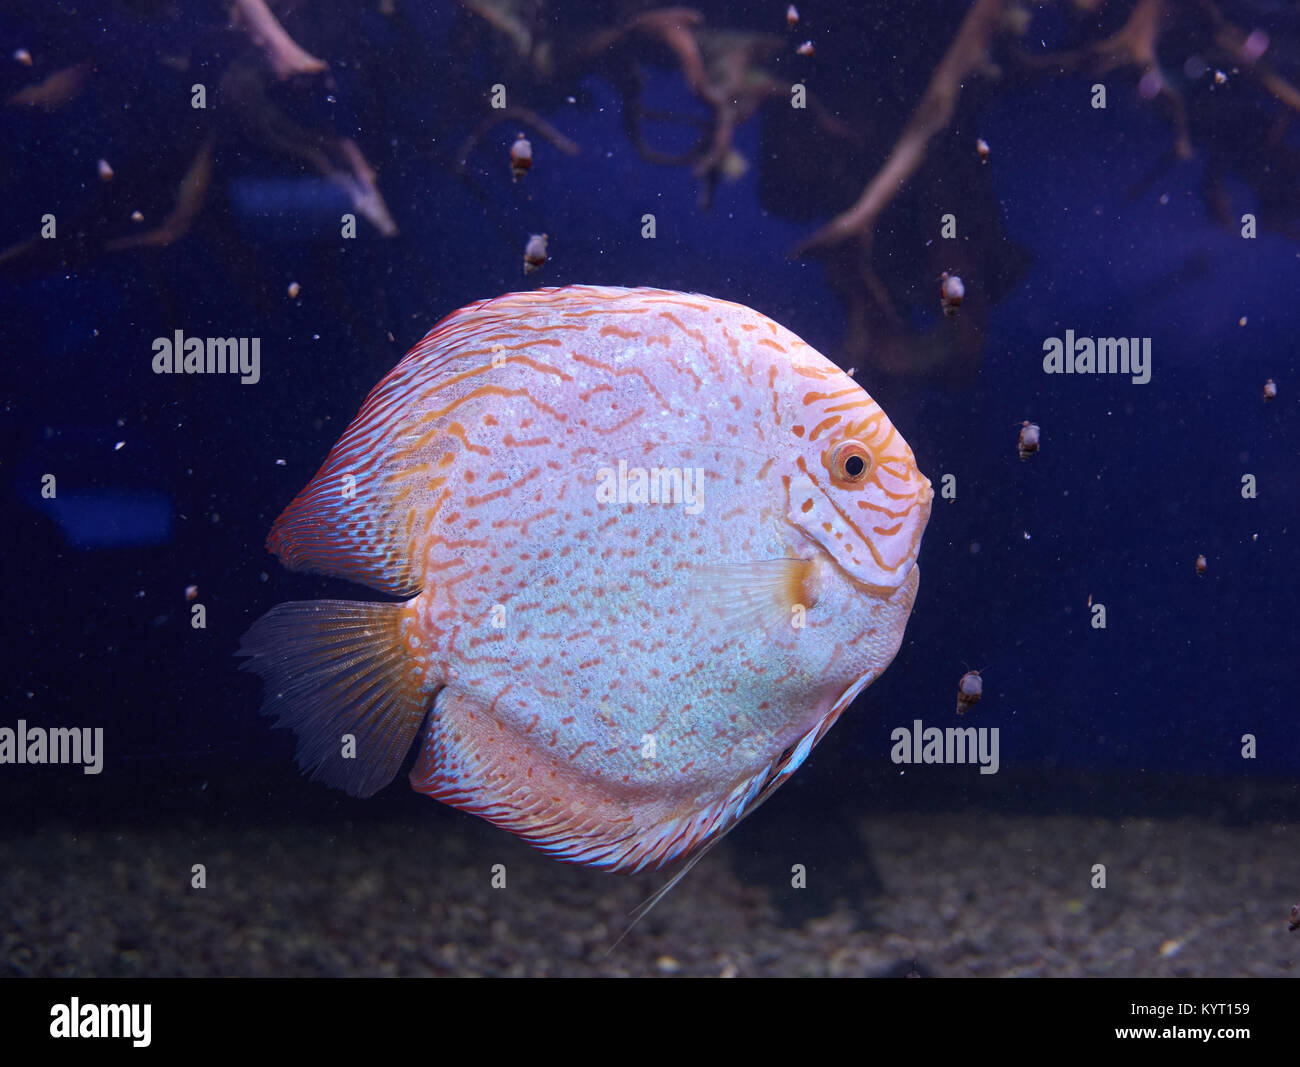 Symphysodon Or Discus Fish From Amazon River In Aquarium Stock Photo